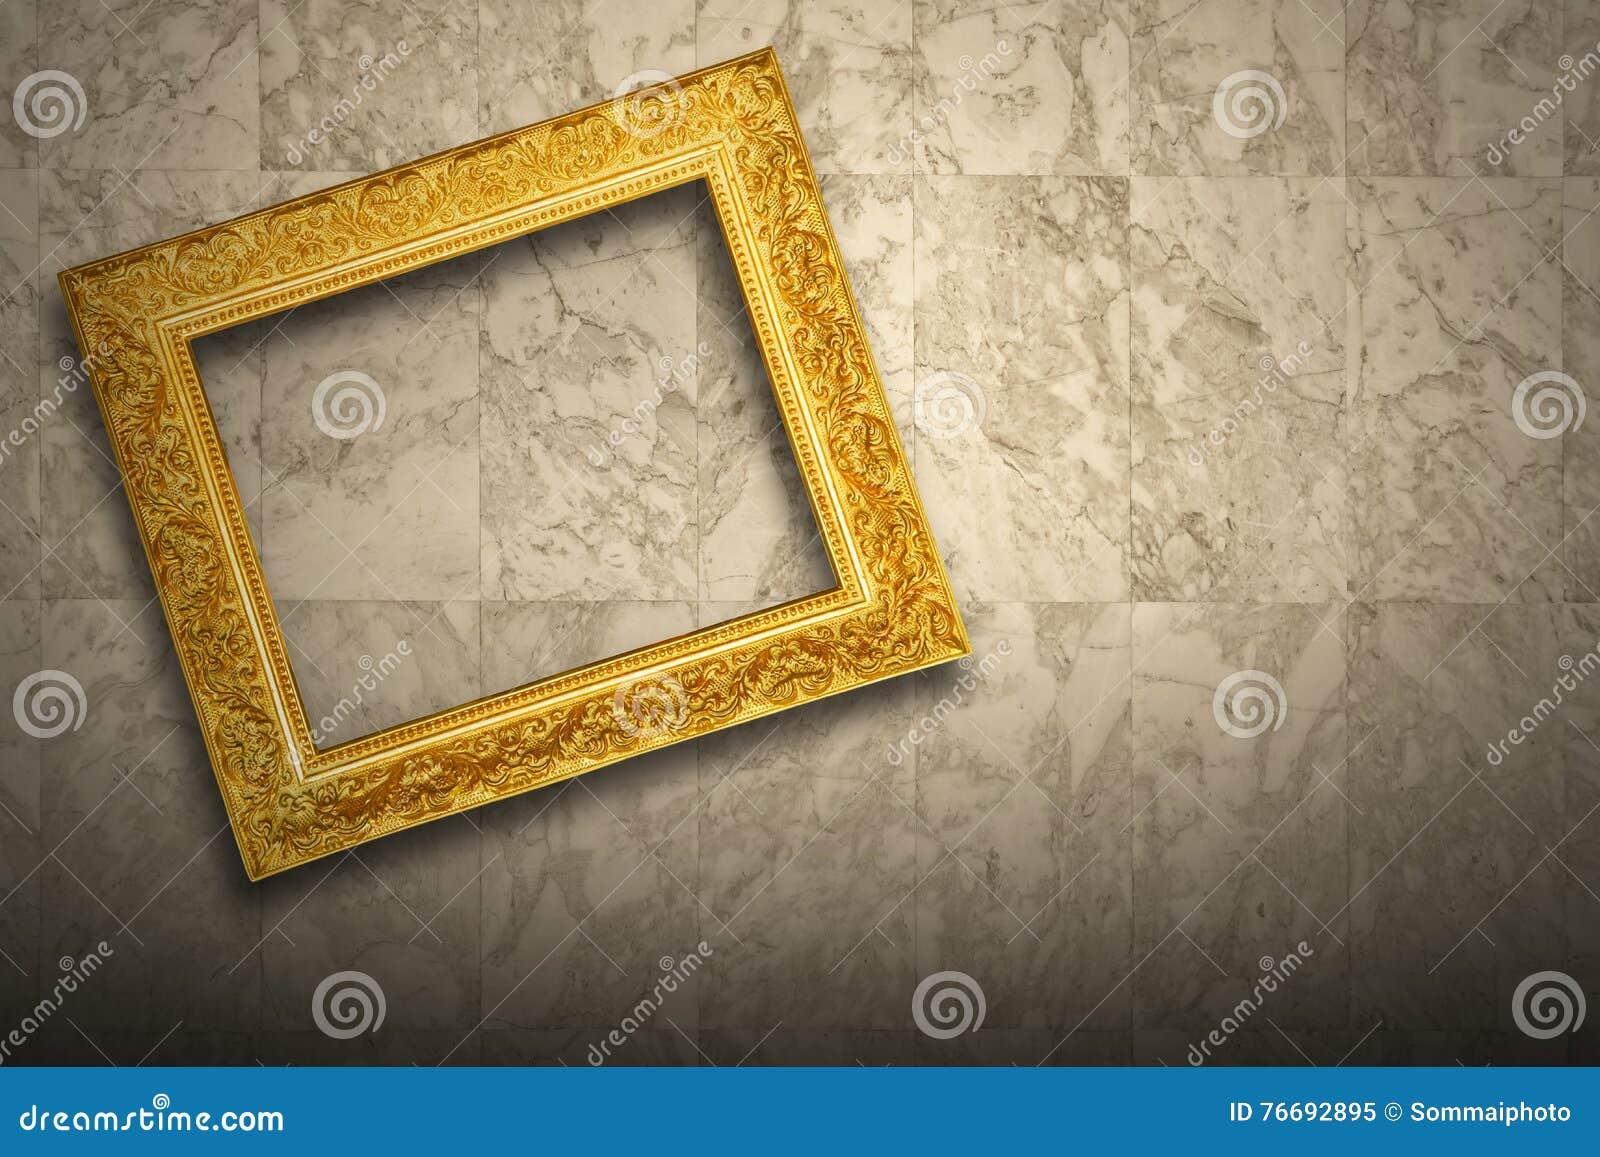 Antiker alter Bilderrahmen stockbild. Bild von gold, marmor - 76692895